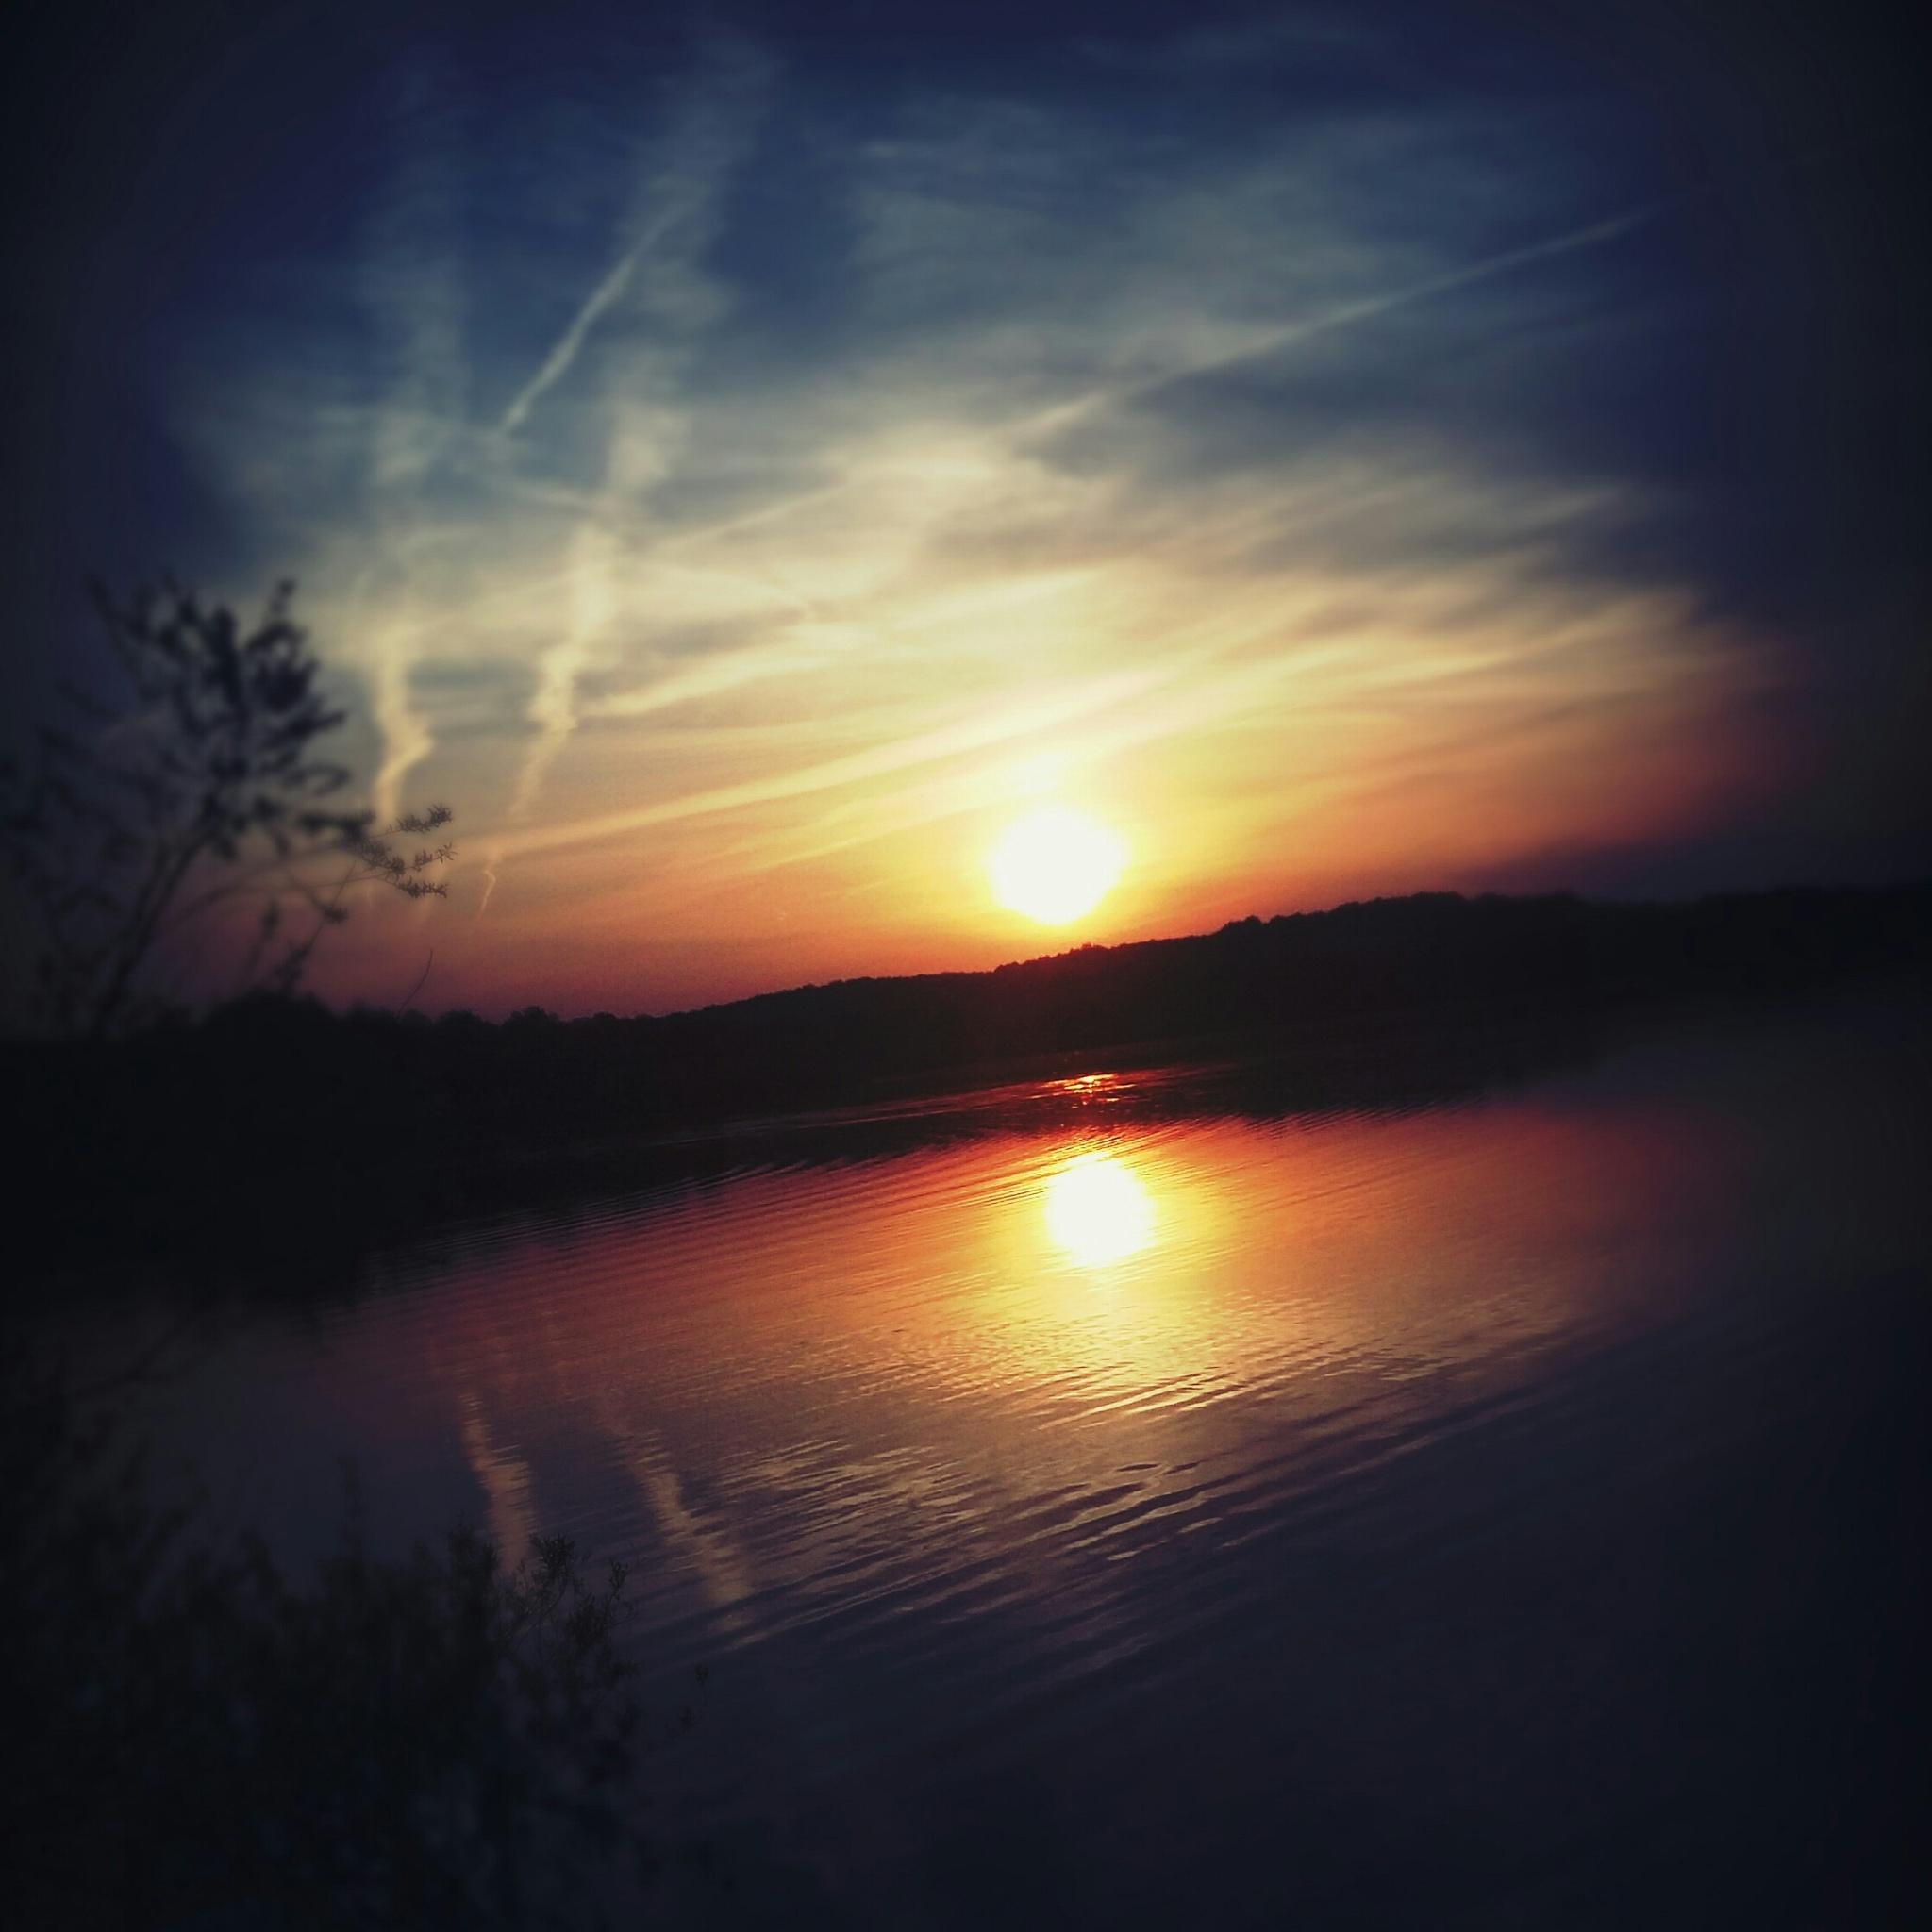 sunset by vannah